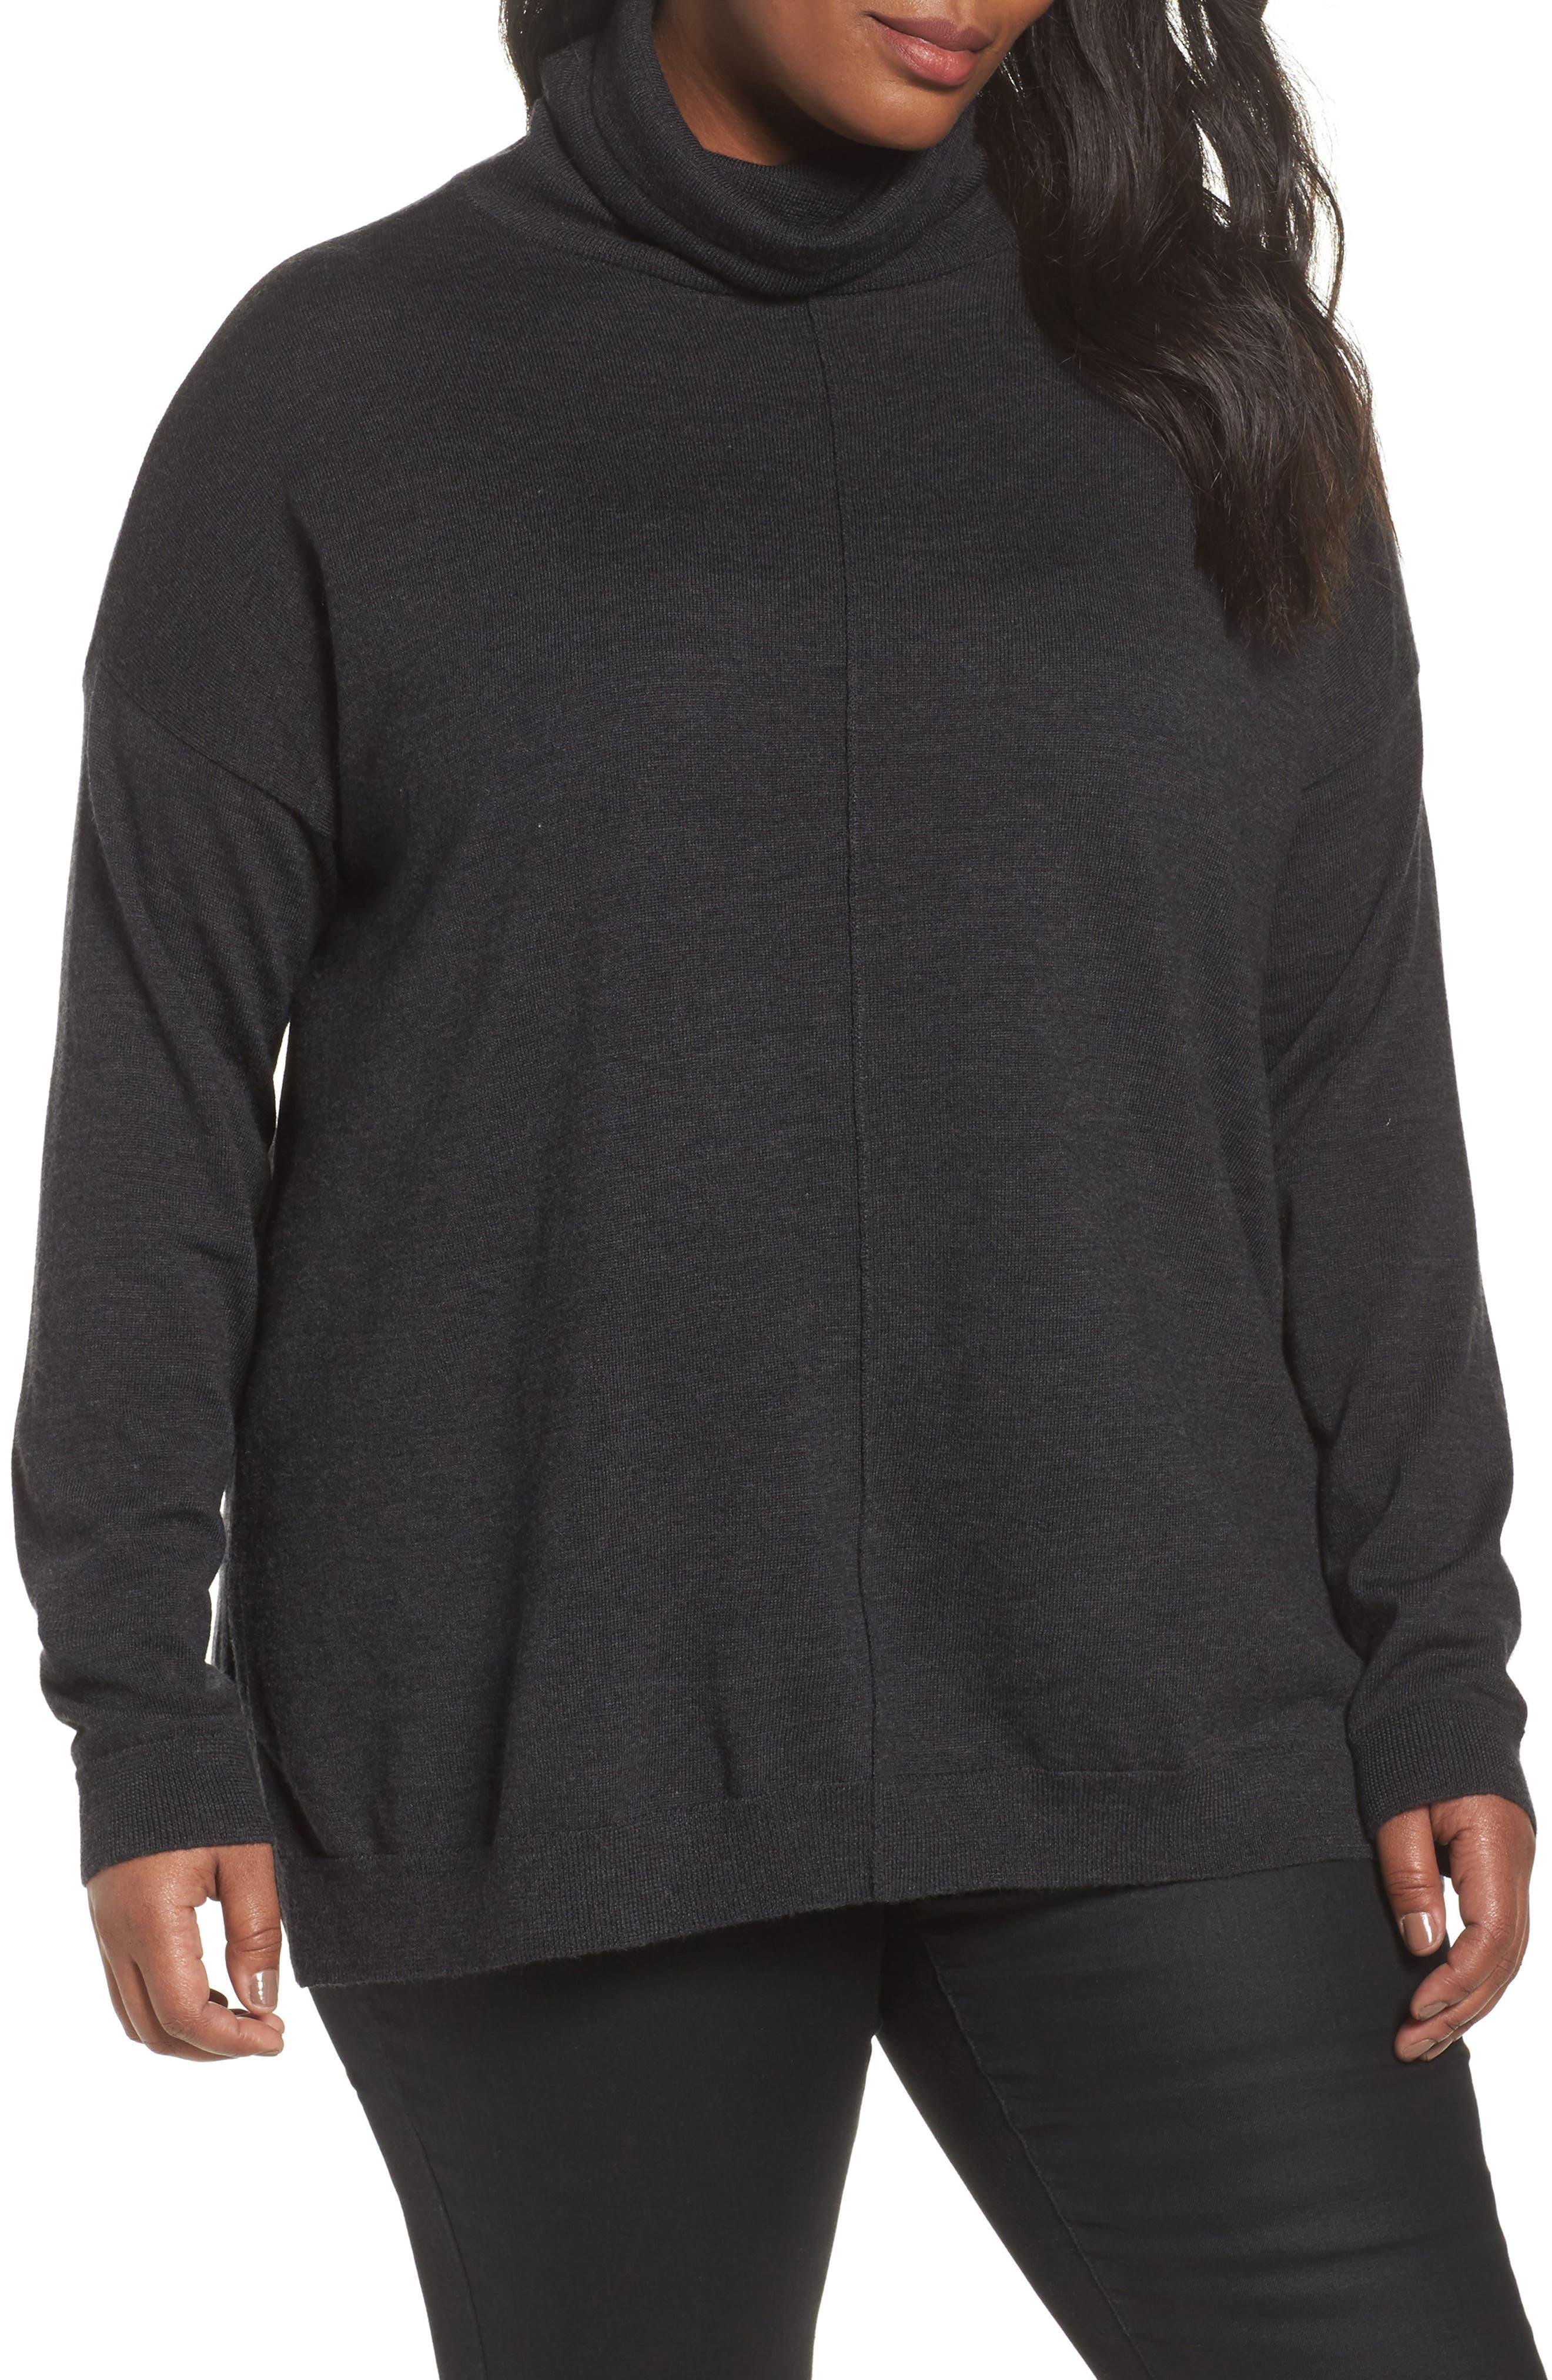 Merino Wool Turtleneck Sweater,                             Main thumbnail 1, color,                             021